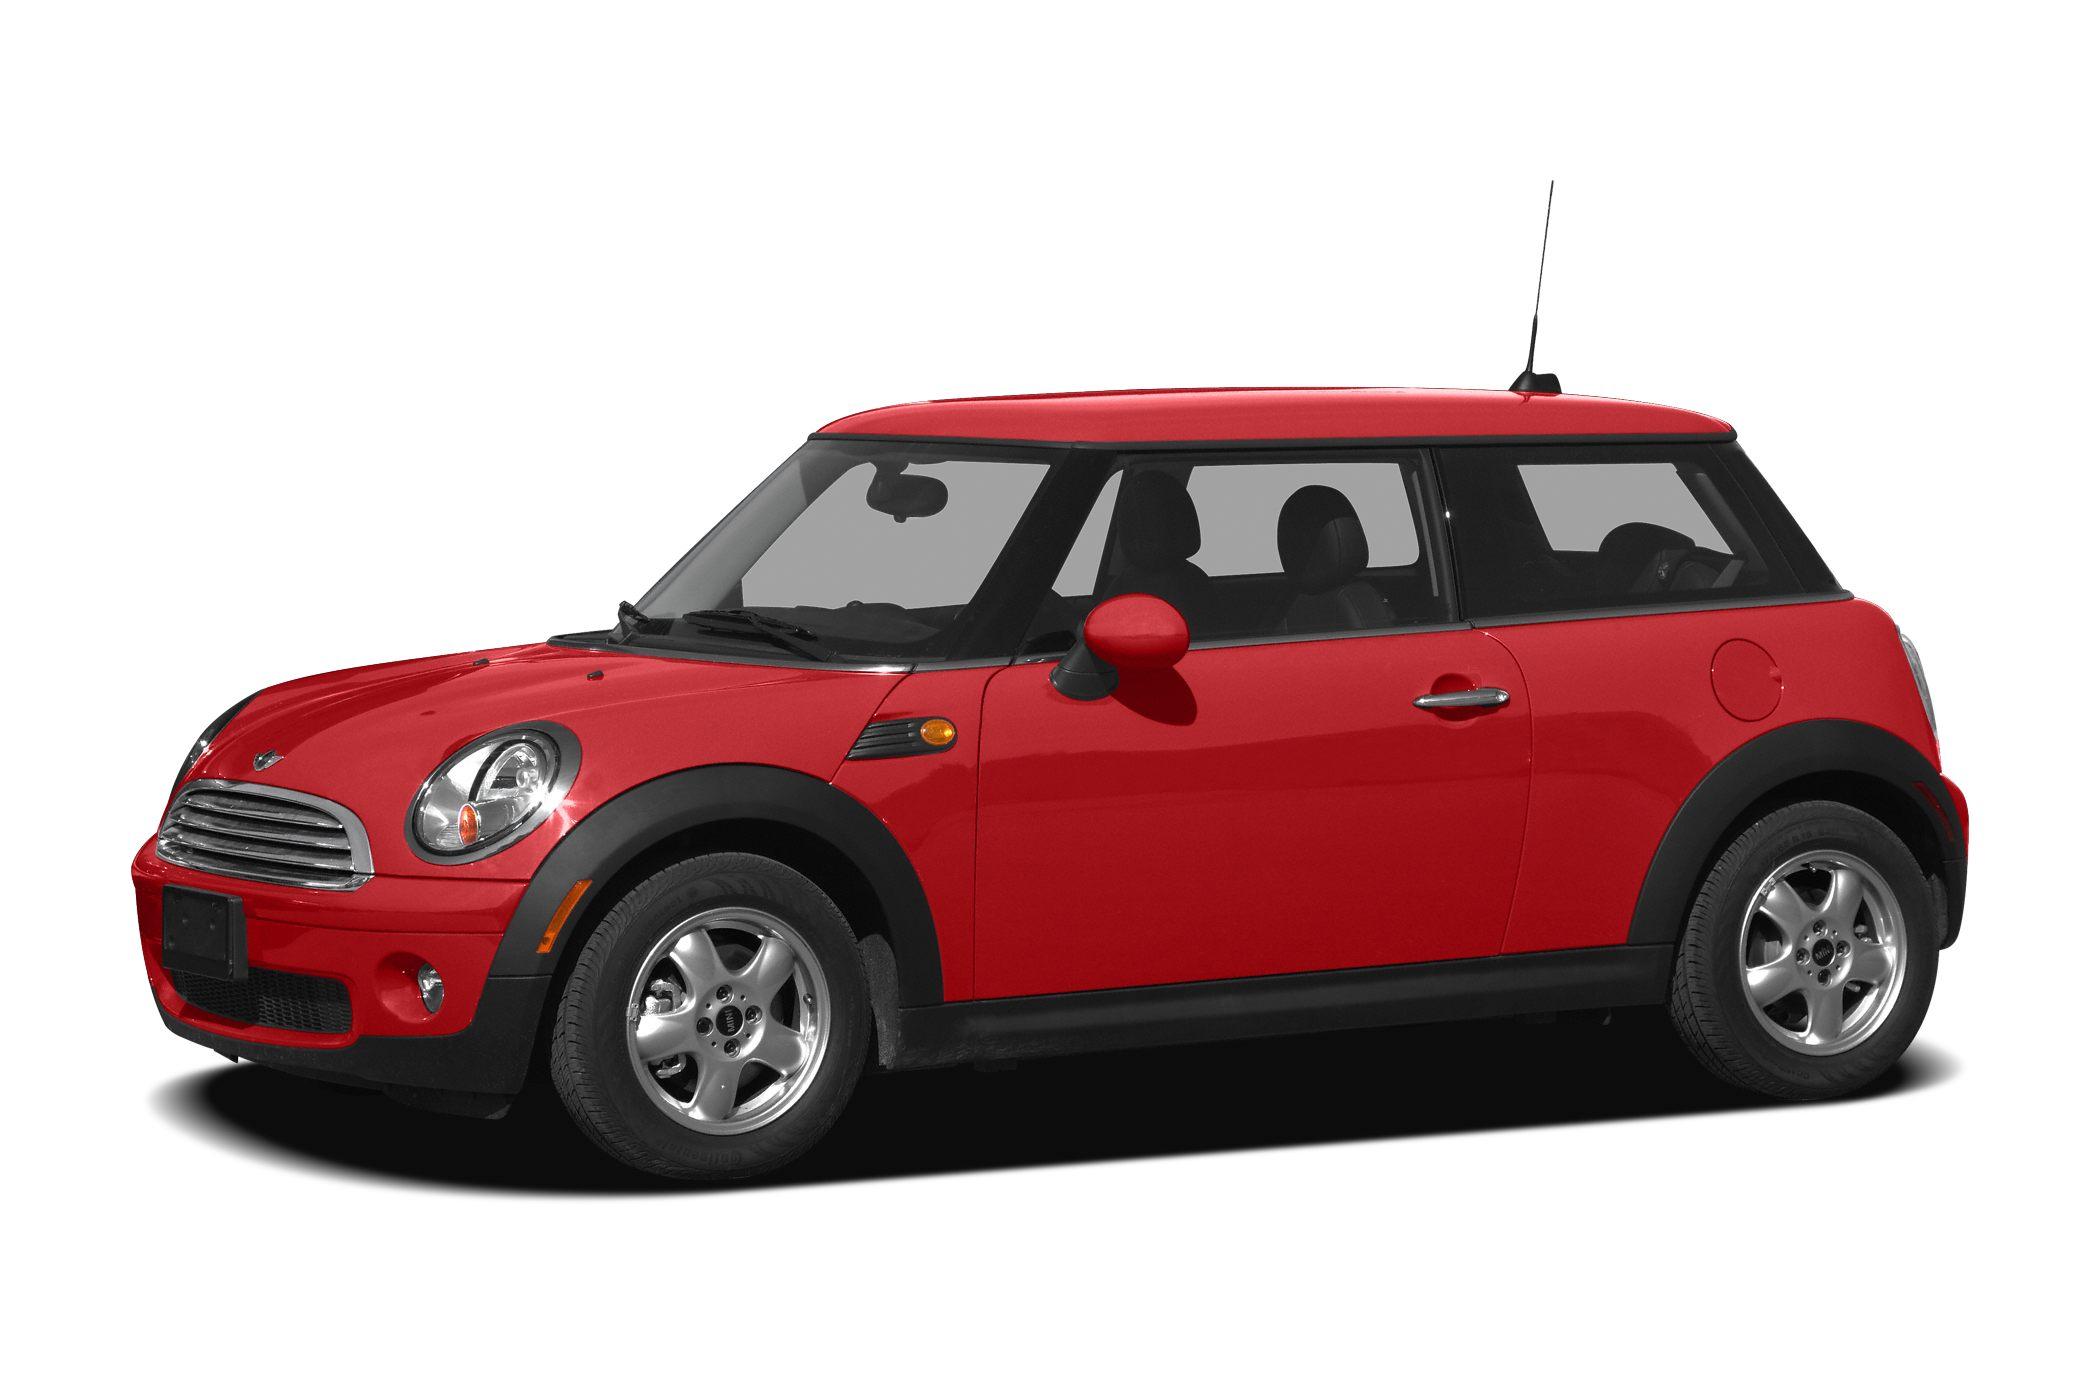 2010 Mini Cooper Pricing And Specs